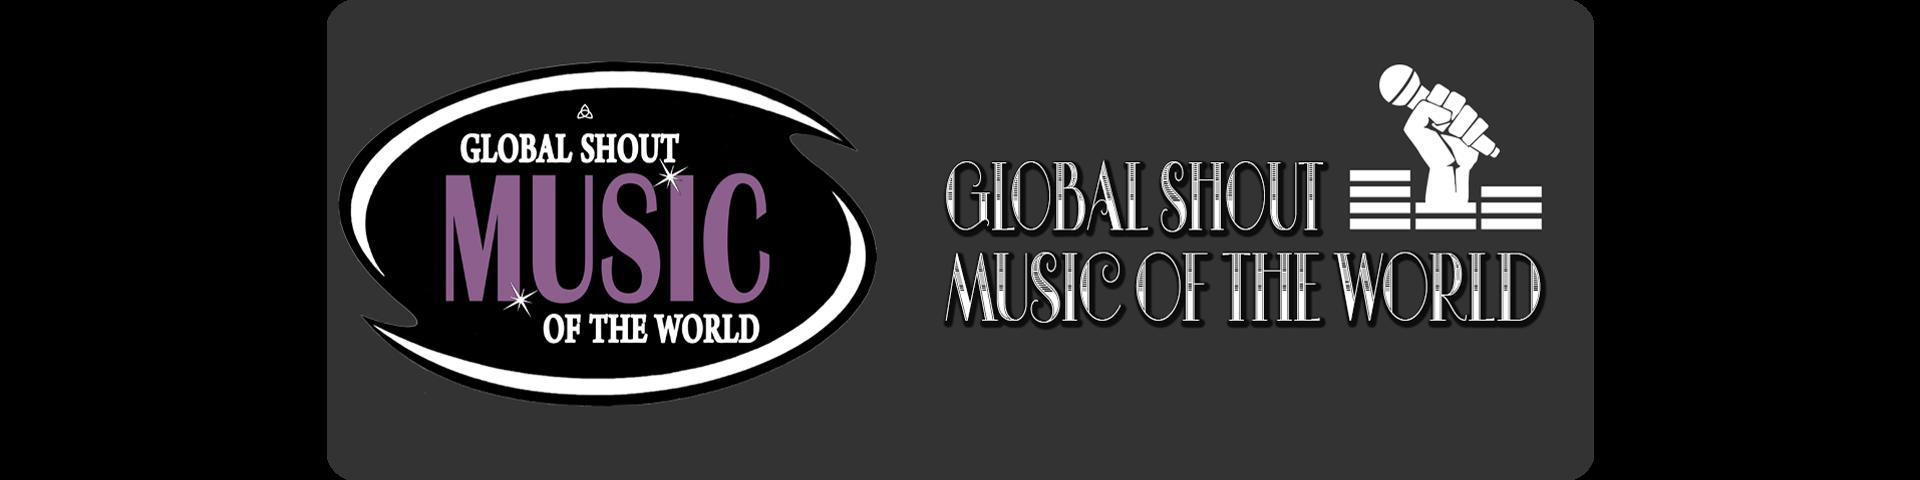 Globalshout รวมเพลงดังระดับโลก